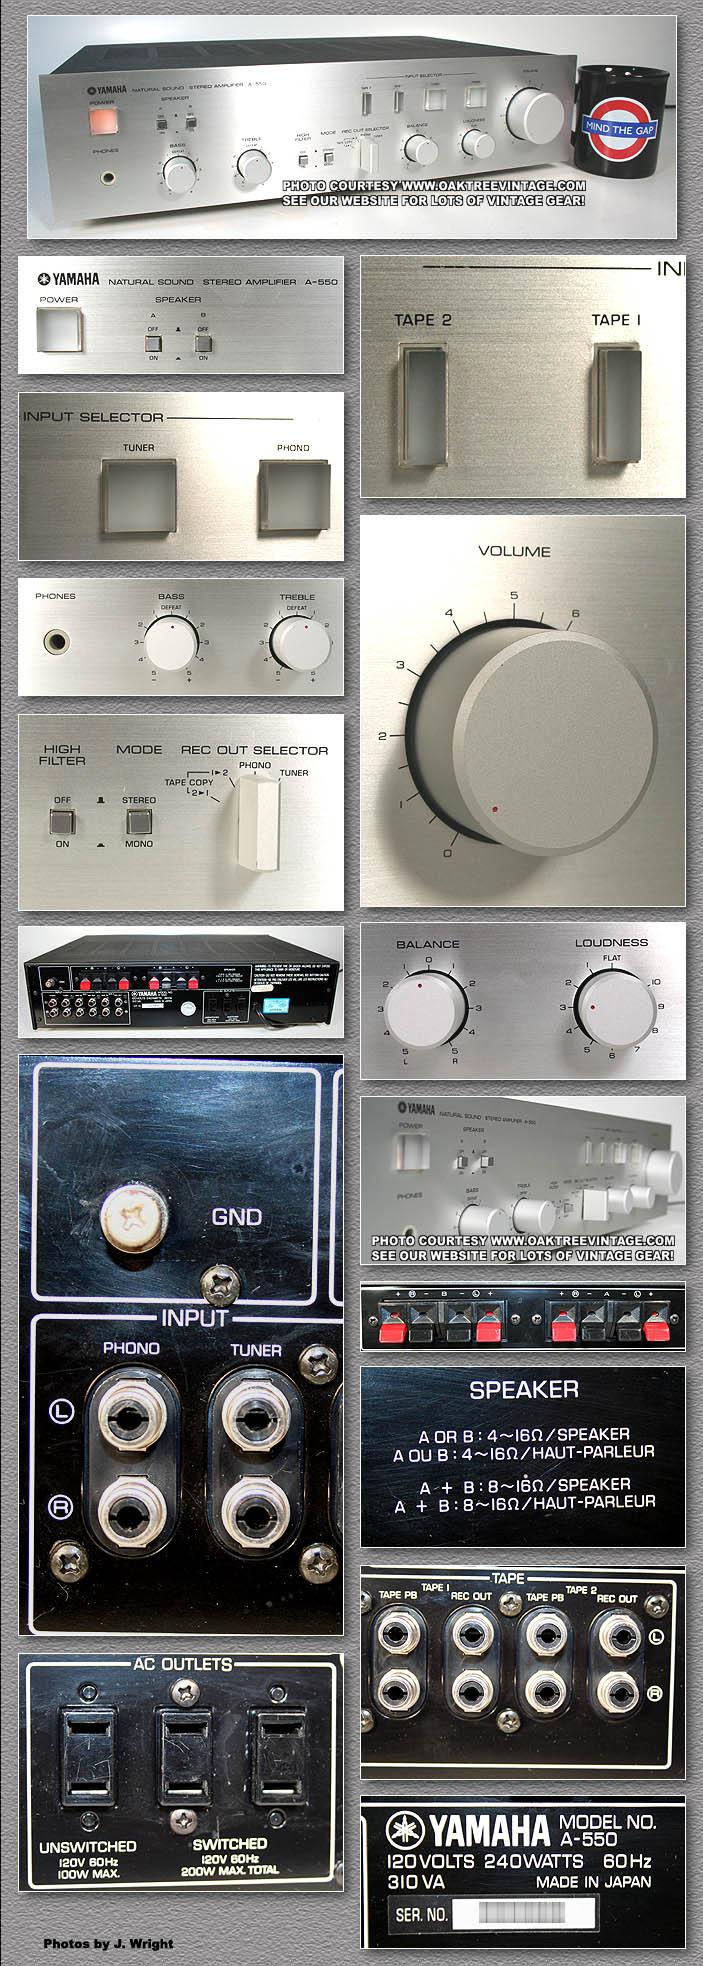 Yamaha Stereo Parts for Vintage Yamaha gear